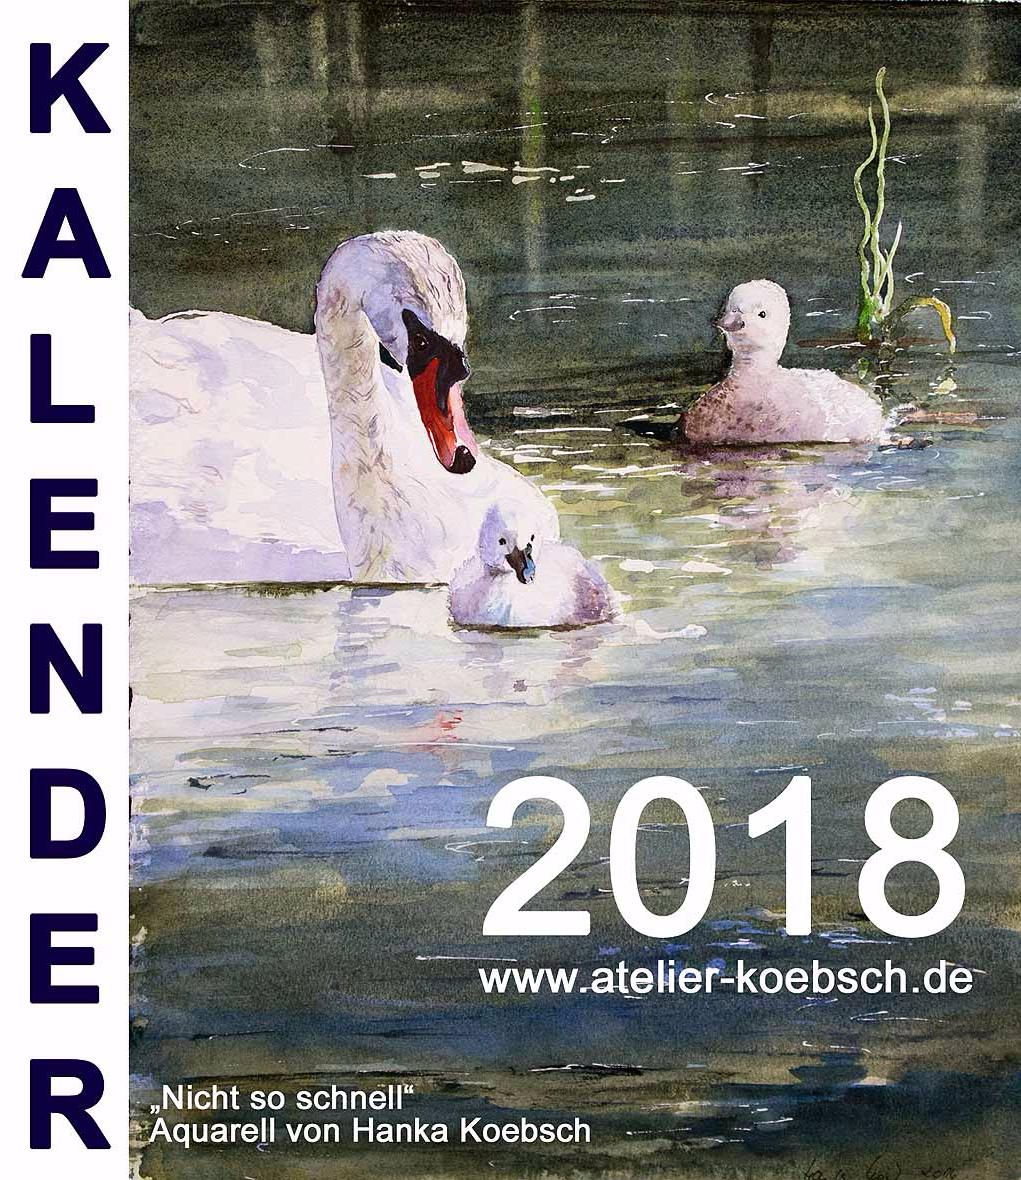 Deckblatt Kalender 2018